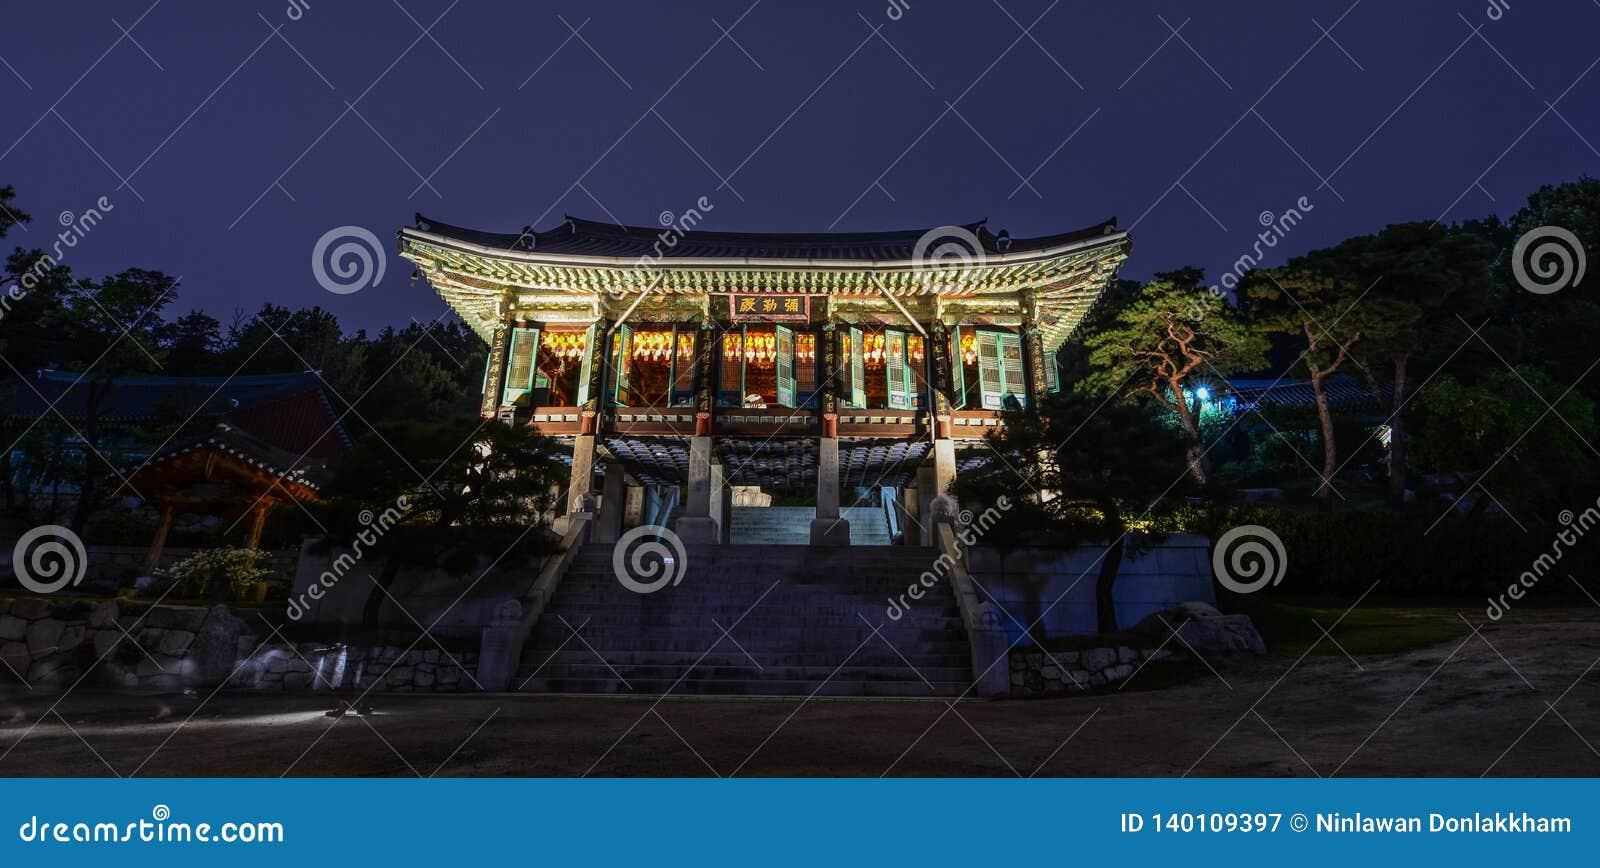 Boeddhistische tempelpagode bij nacht in Seoel